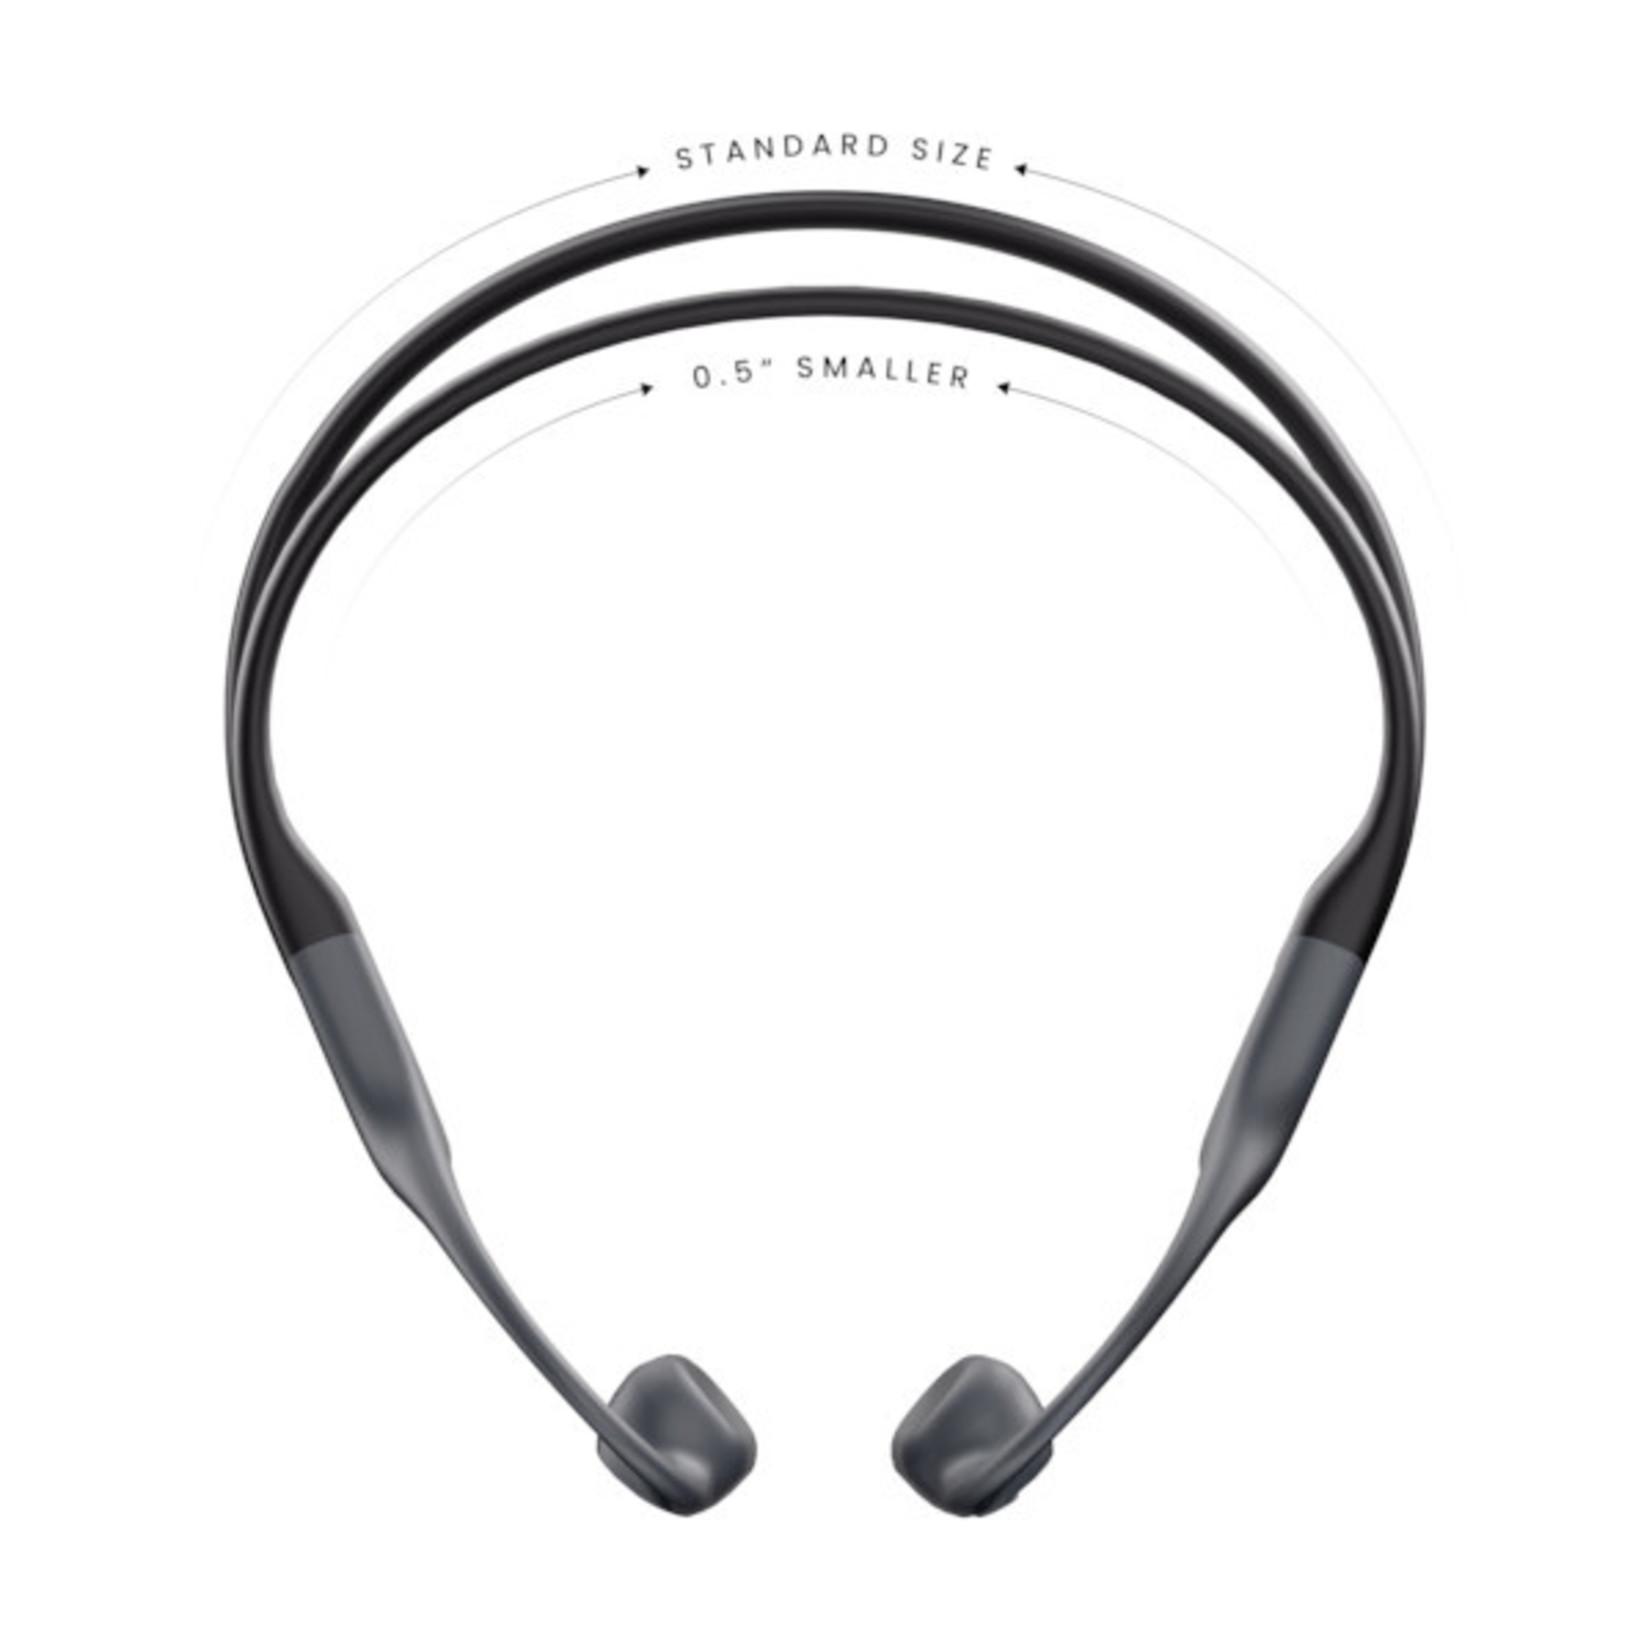 Aftershokz AFTERSHOKZ AEROPEX WIRELESS HEADPHONES COSMIC BLACK